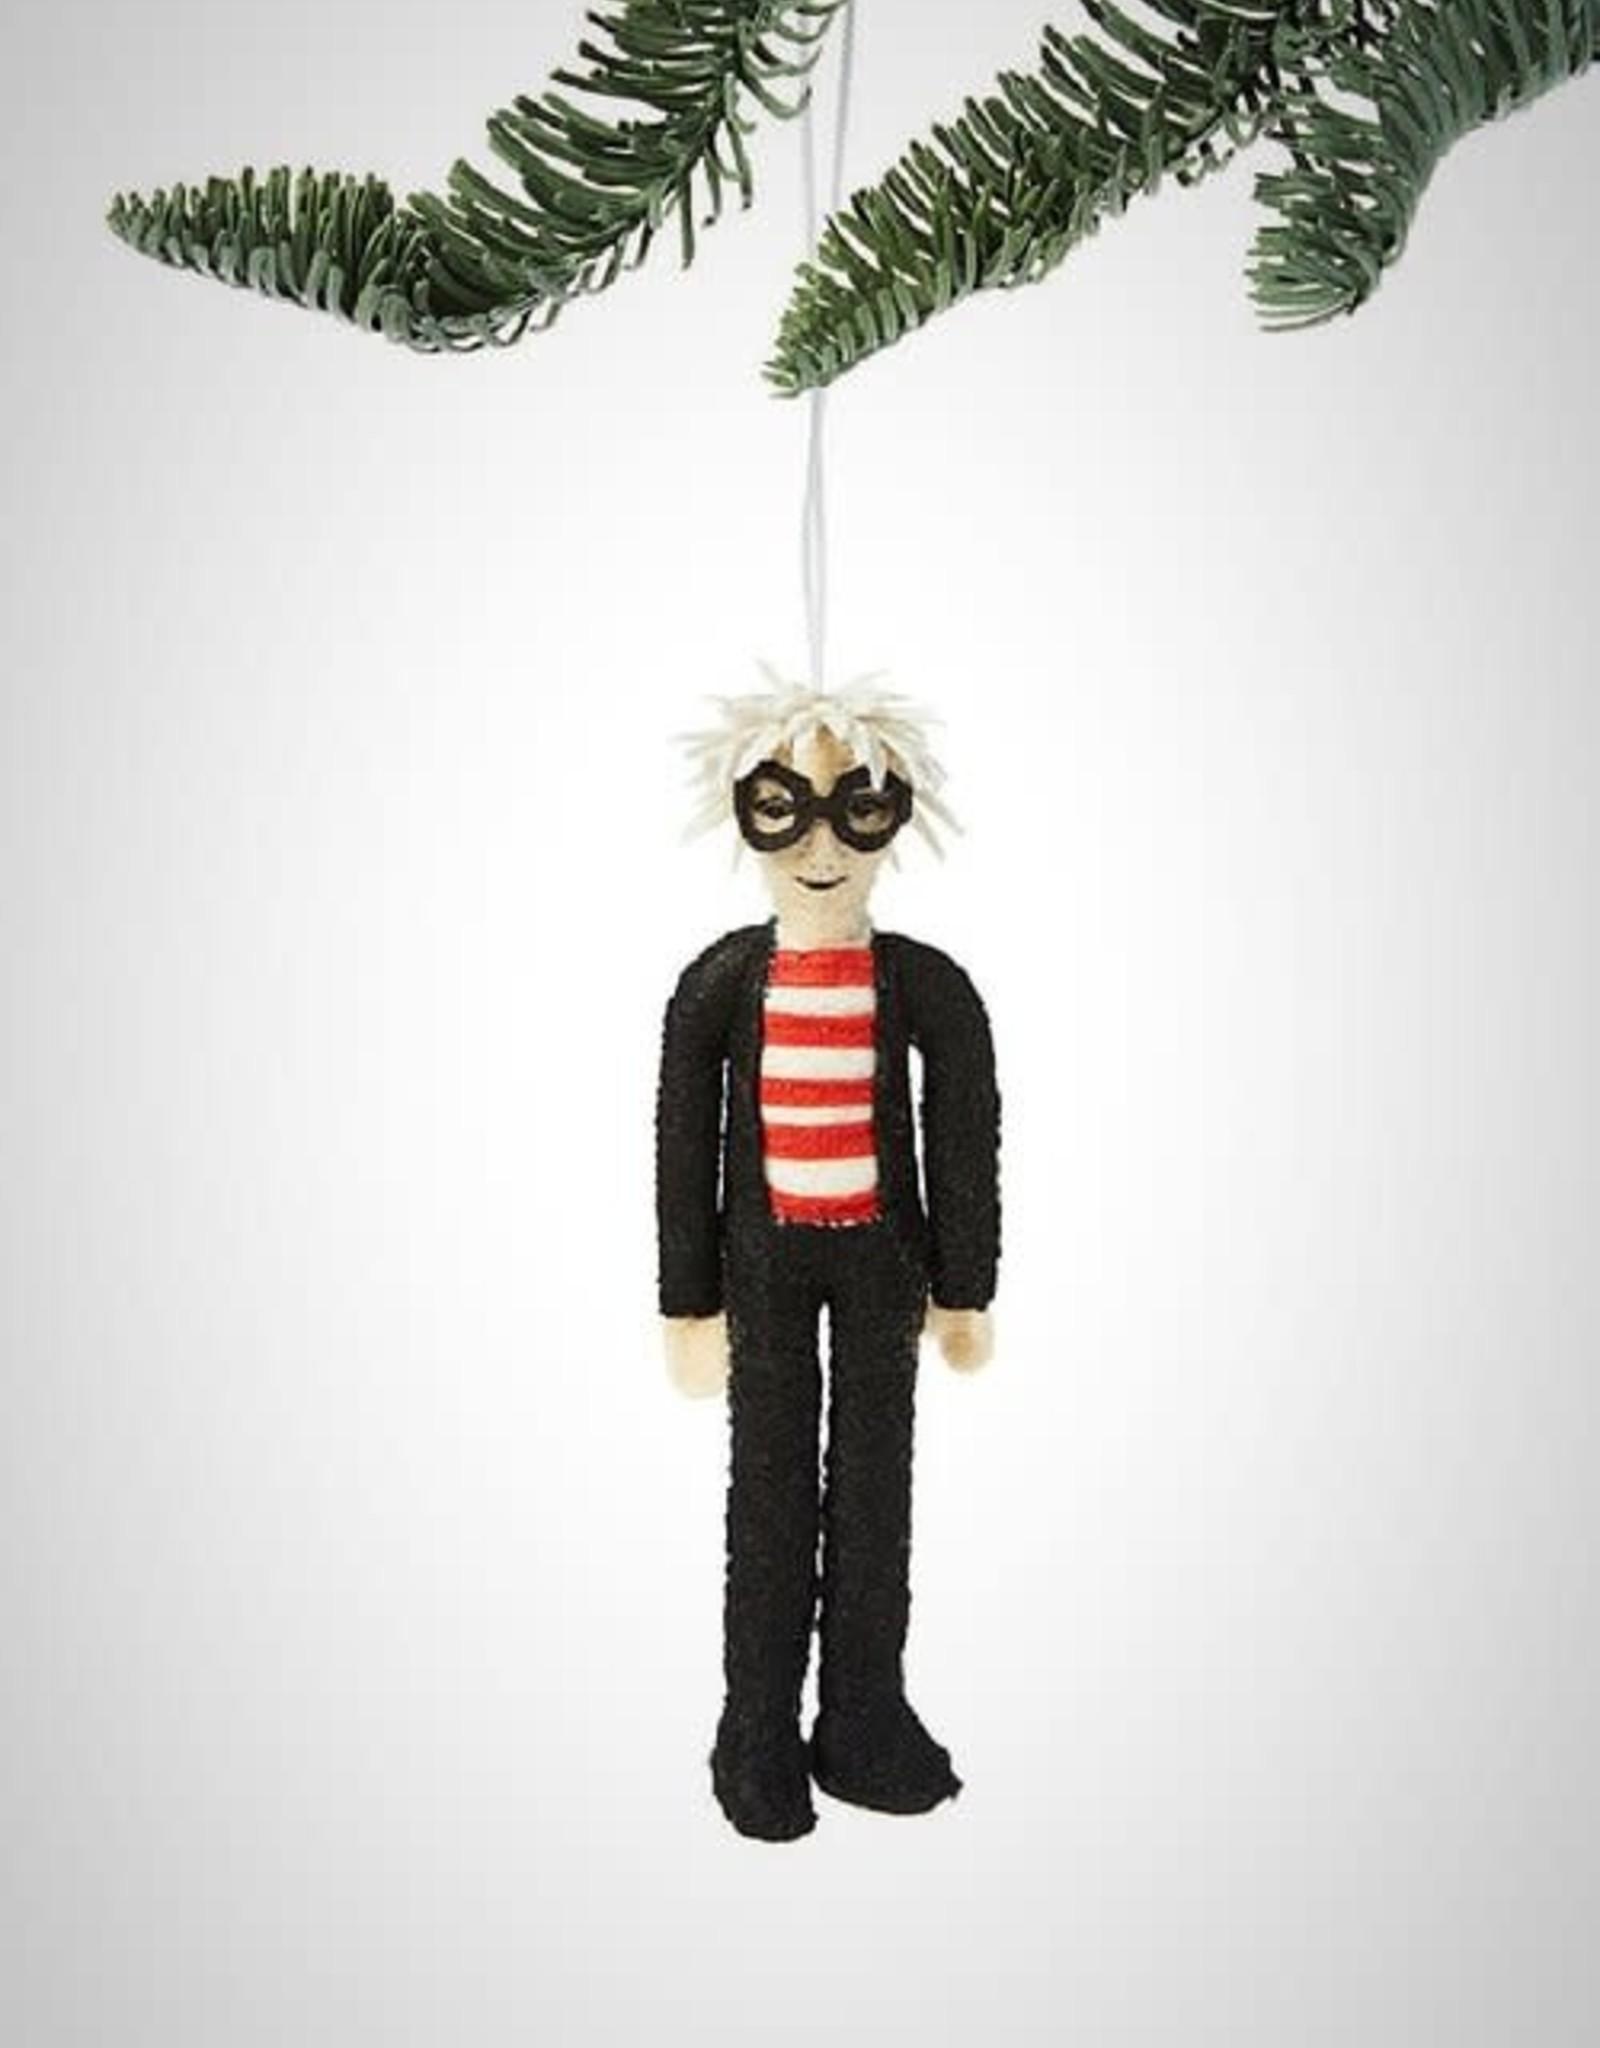 kyrgyzstan, Ornaments Andy Warhol